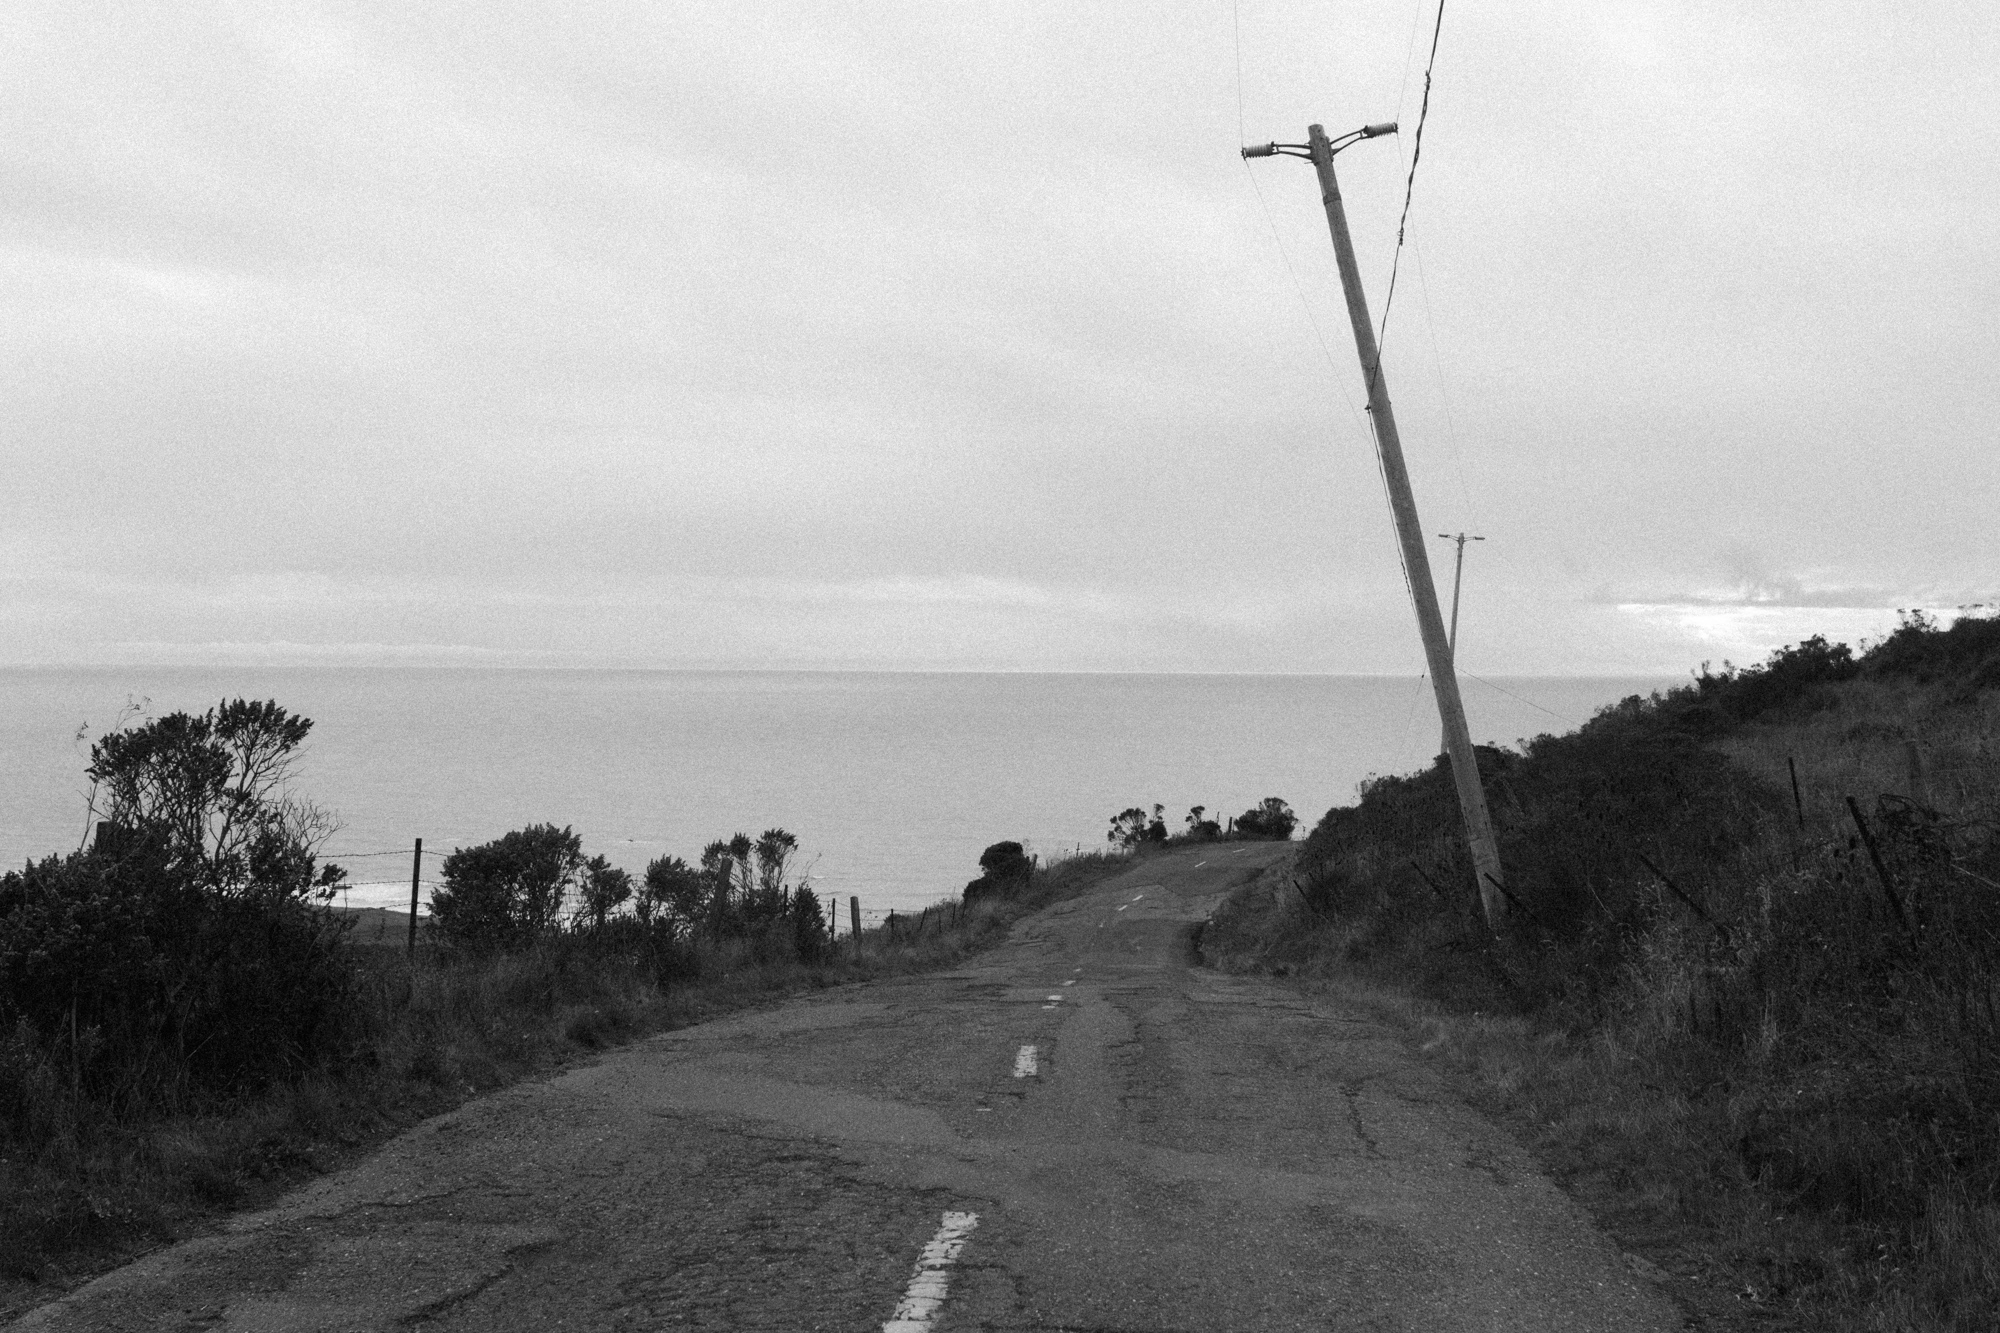 Country road, take me home...